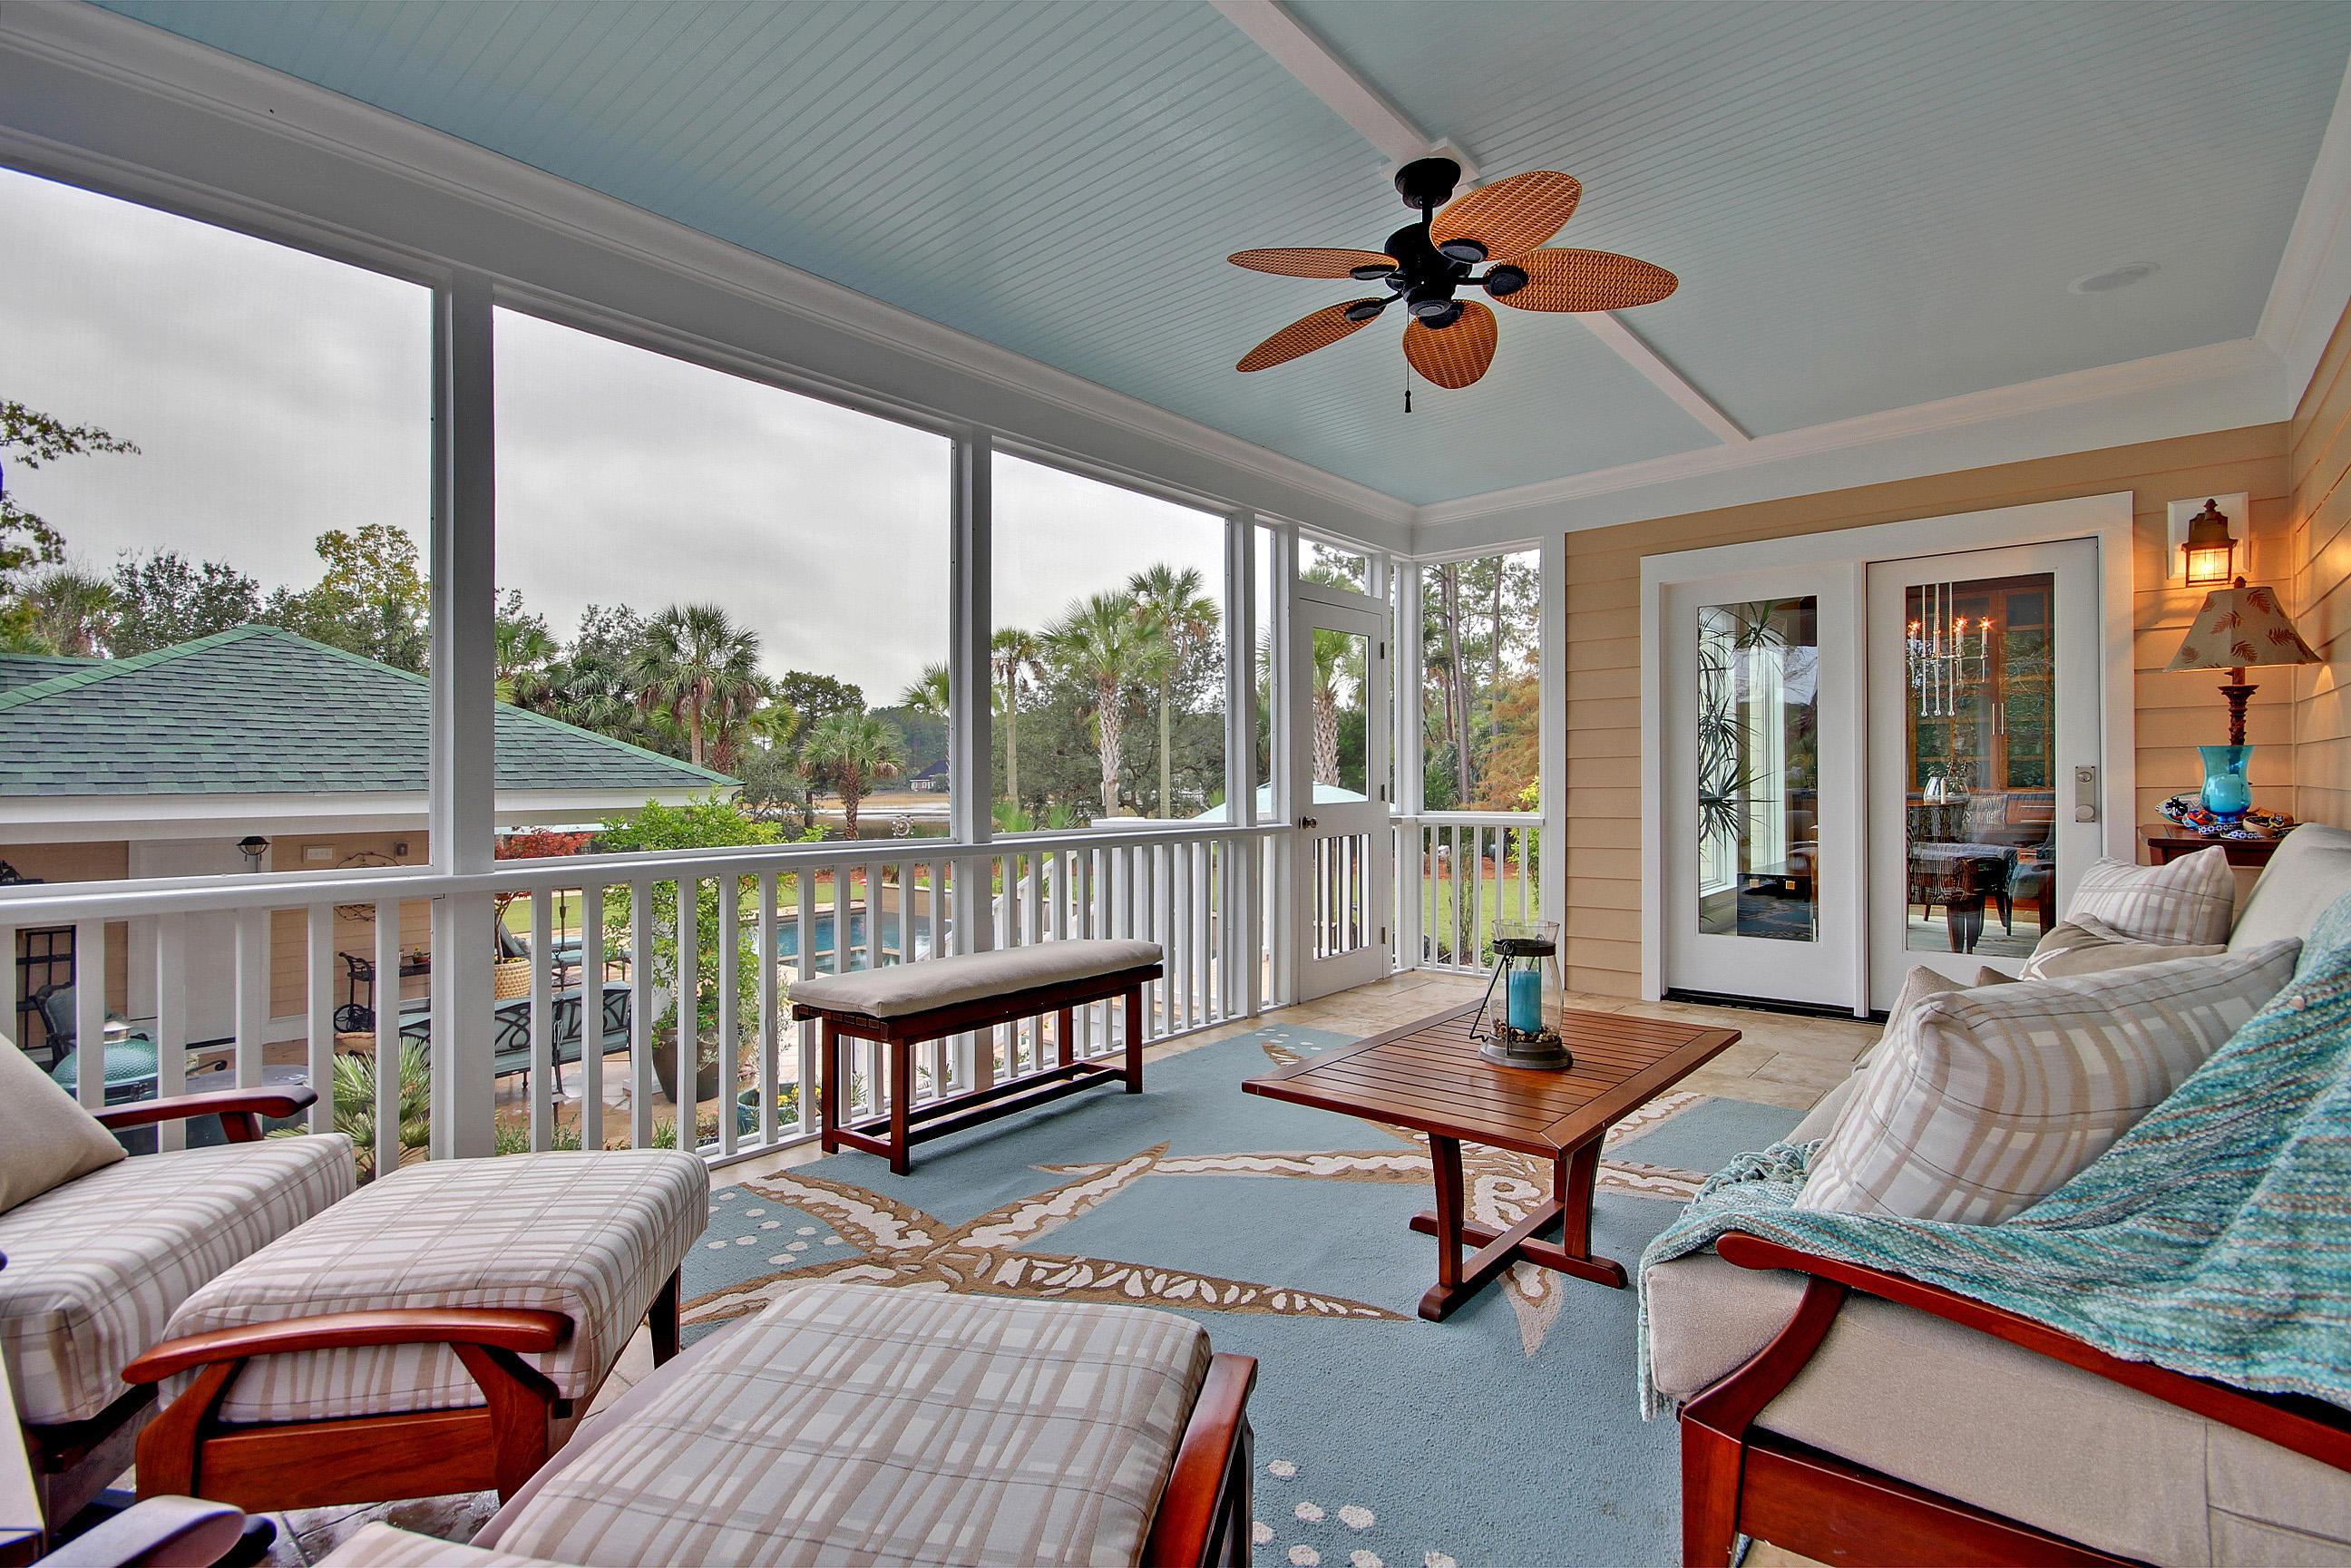 Dunes West Homes For Sale - 2364 Darts Cove, Mount Pleasant, SC - 27